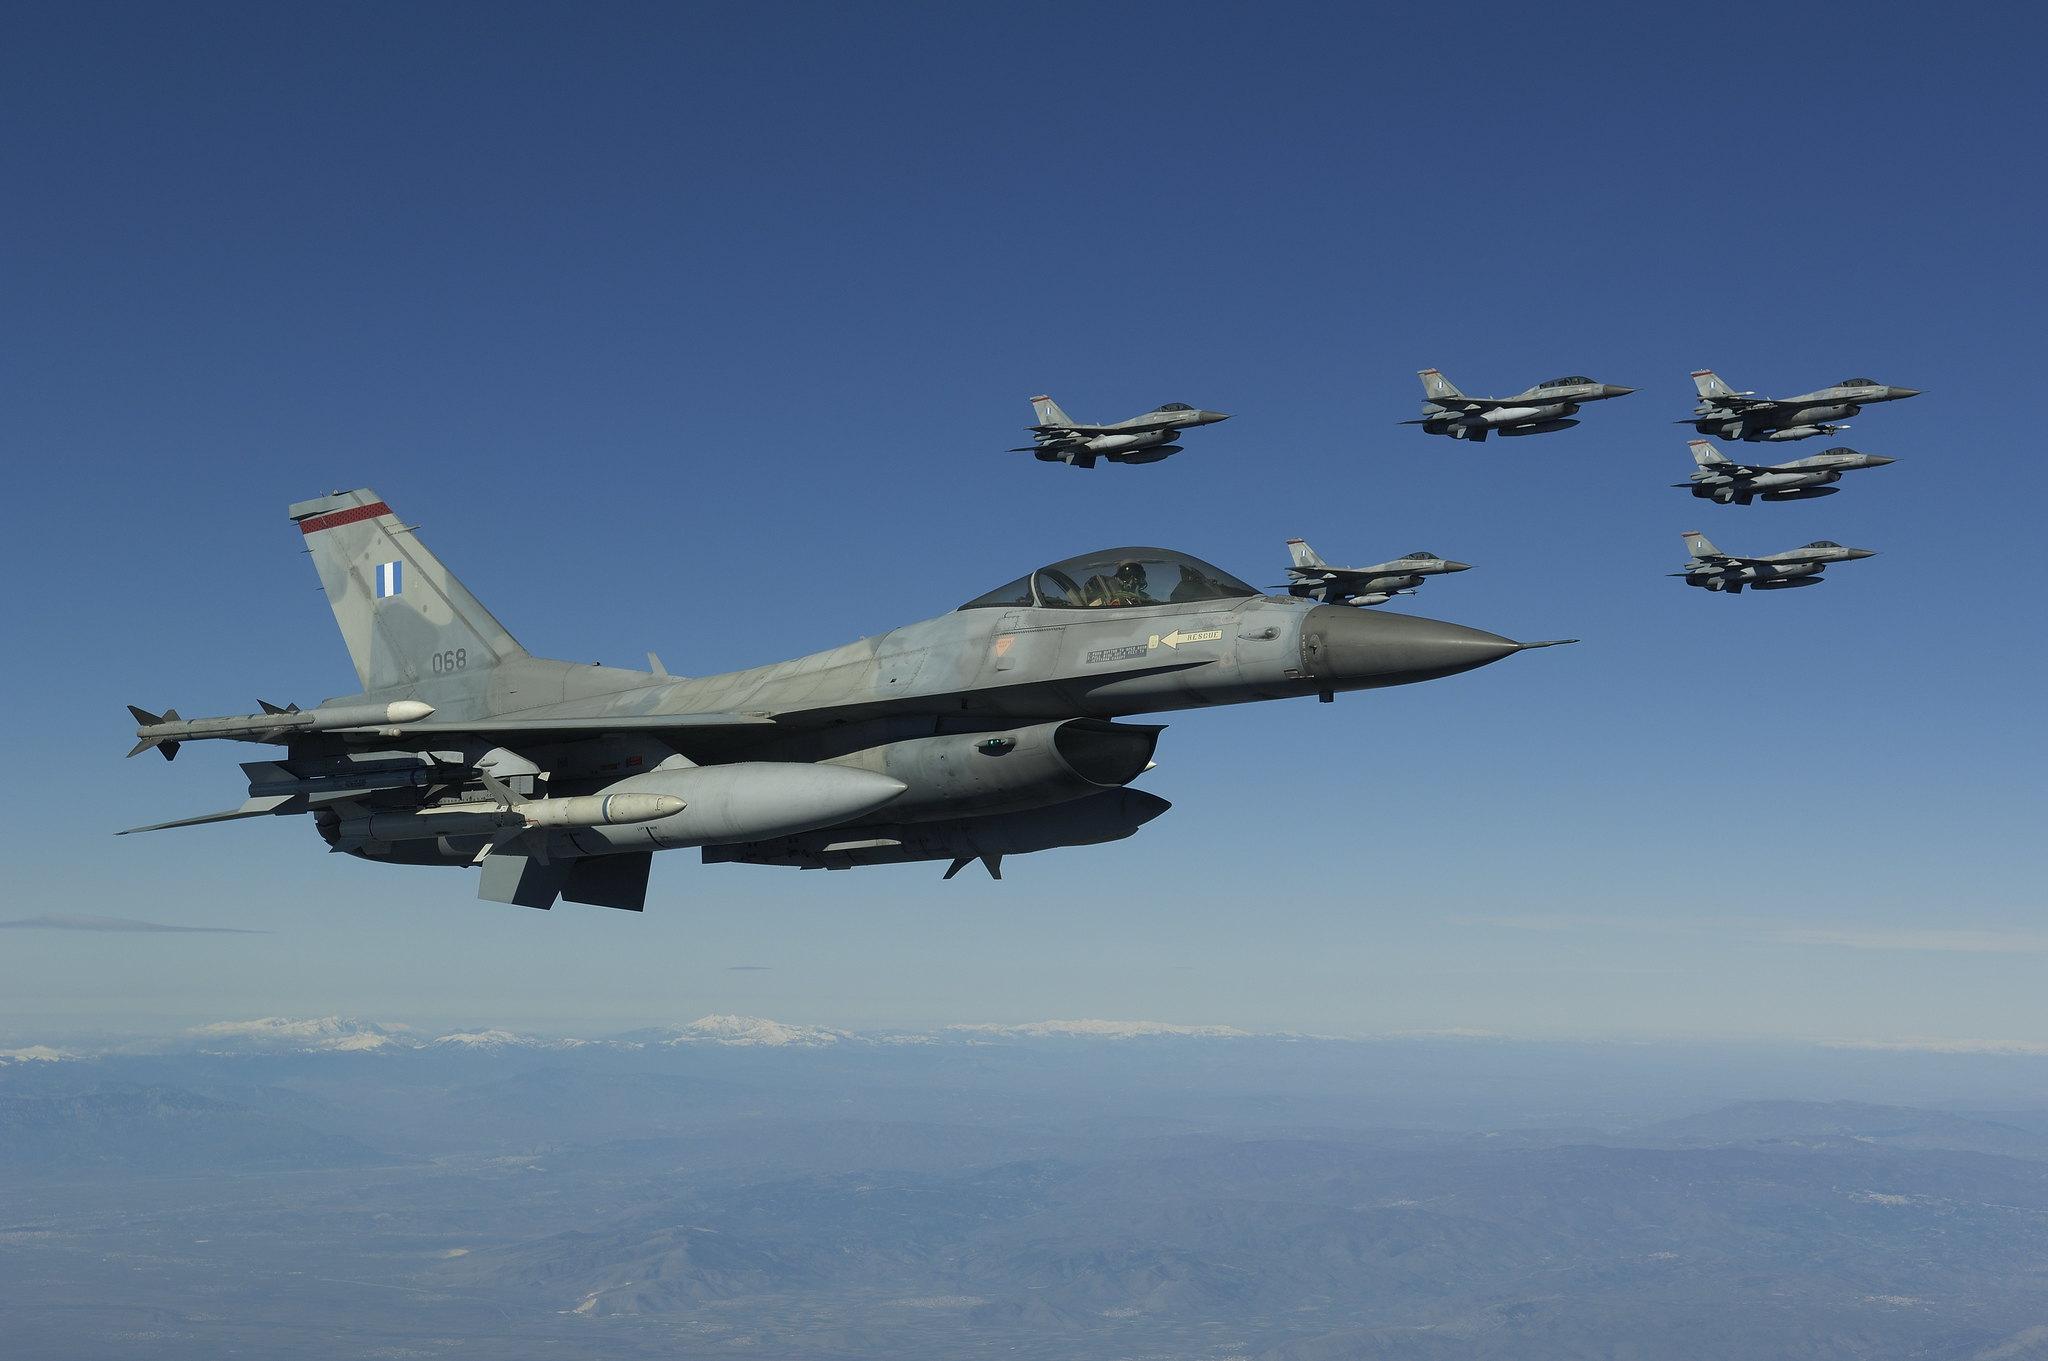 Photo of Έρχονται αναβάθμιση F-16 Block 50 και προμήθεια κορβετών στο μέλλον